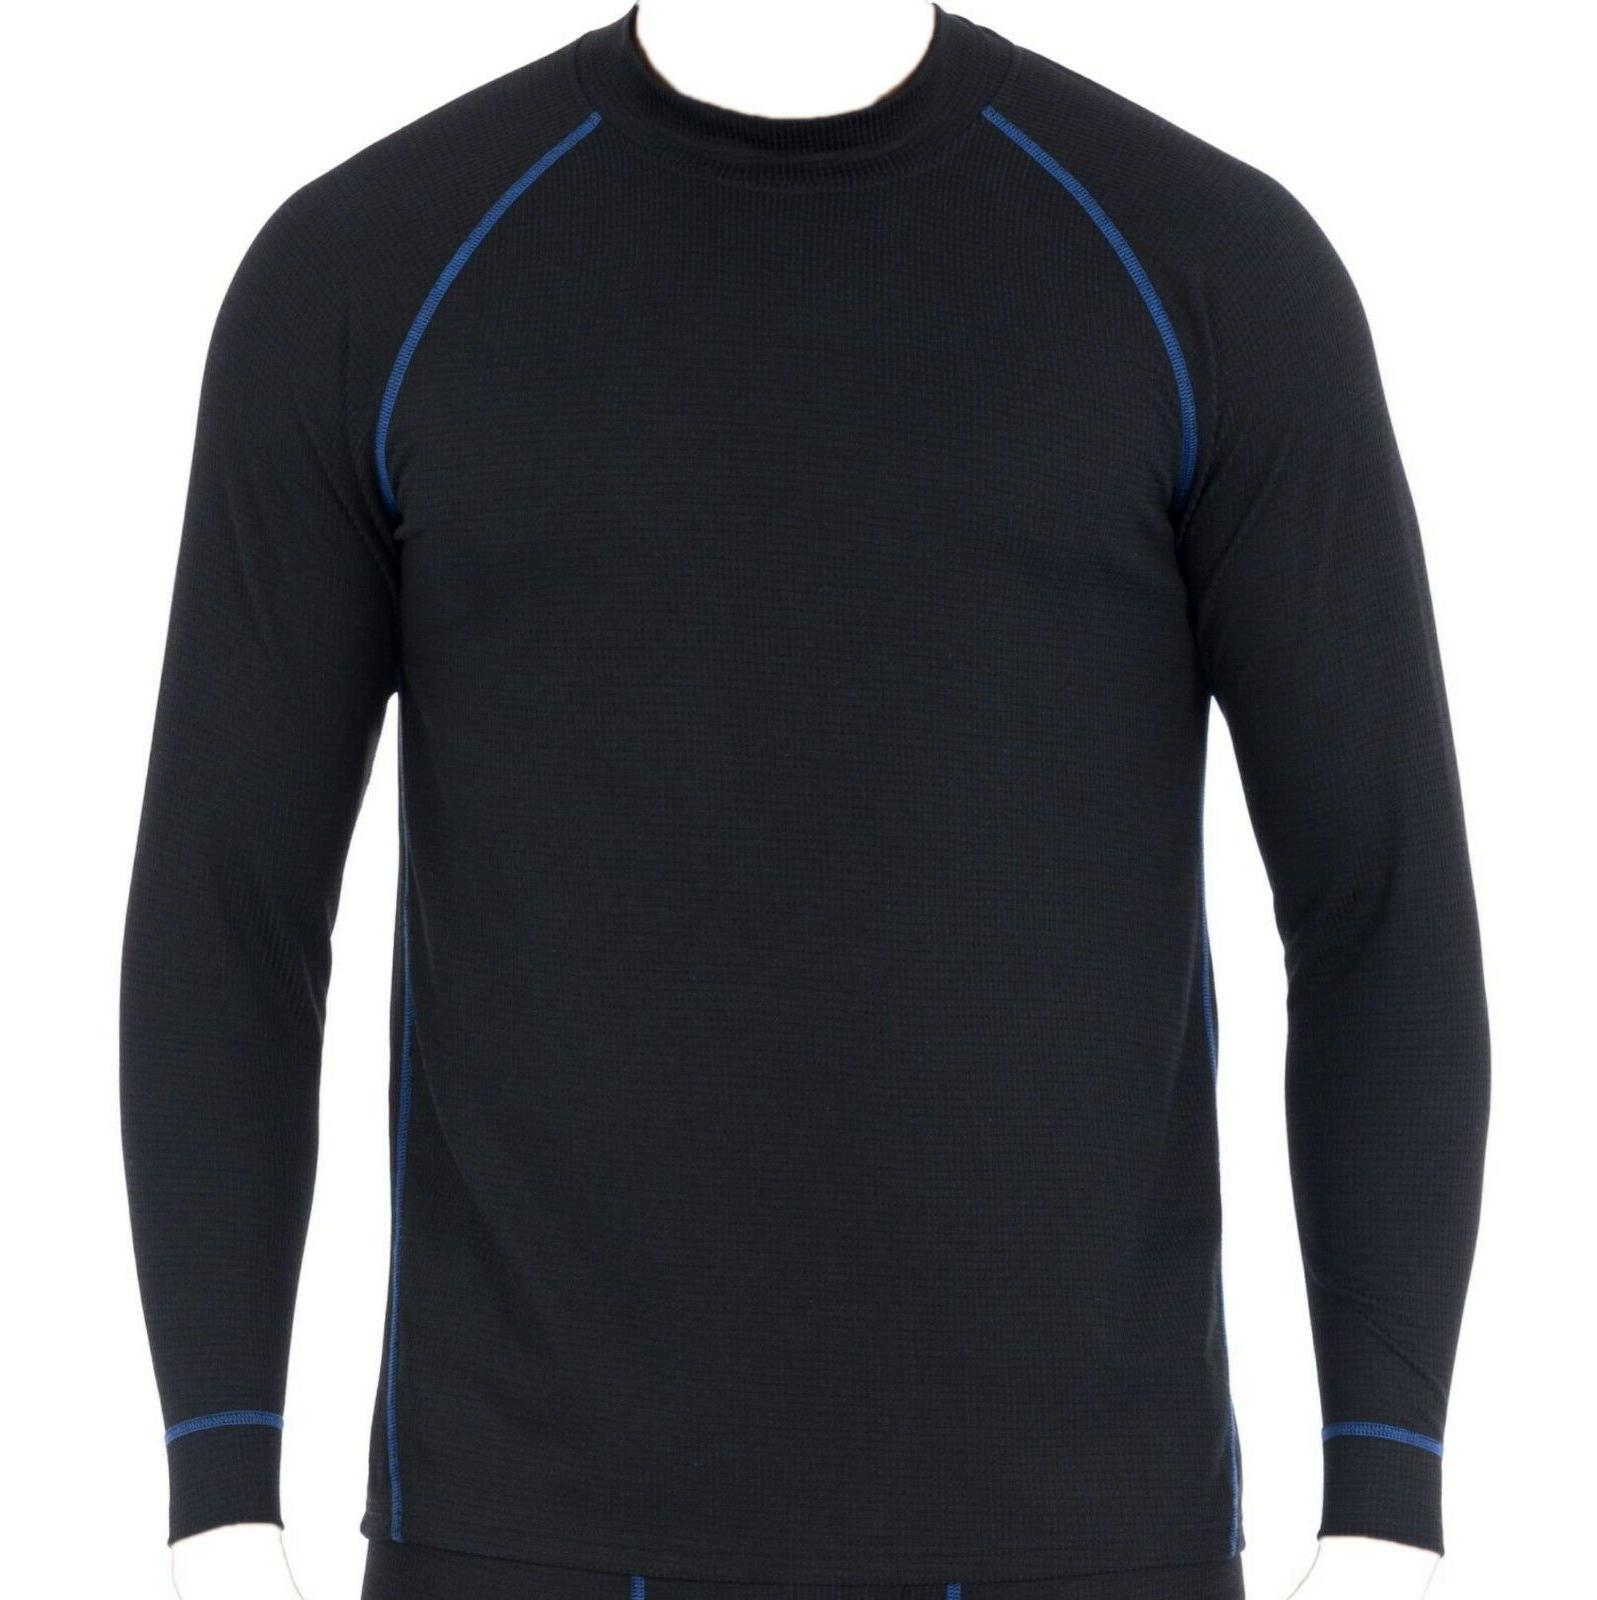 thermal shirt top performance crew tech grid